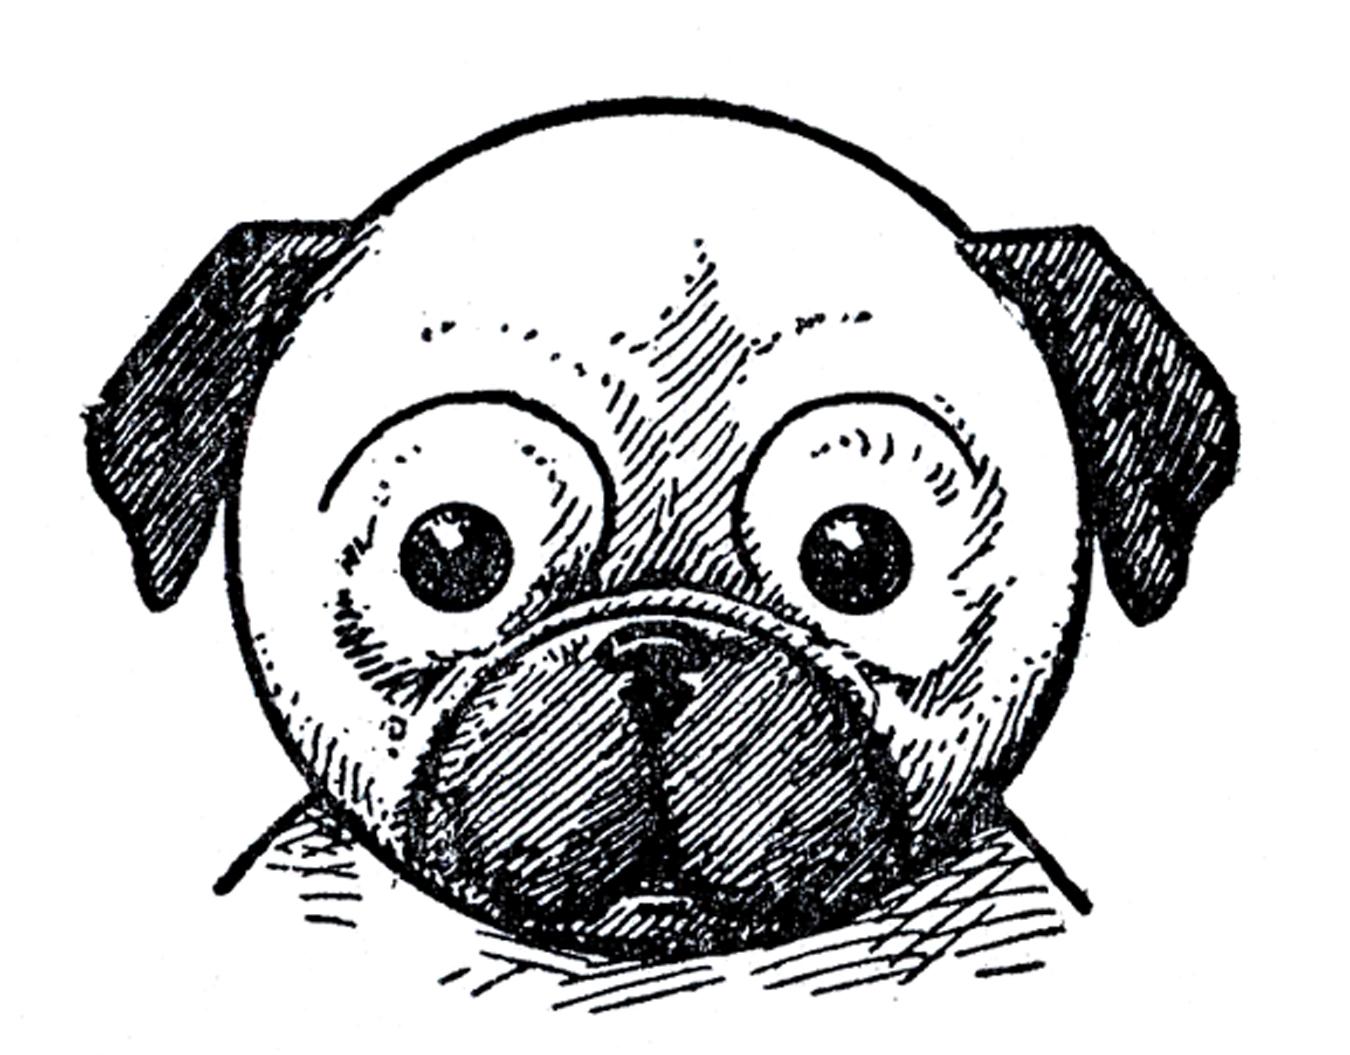 Drawn pug black and white Graphics Pug Fairy – Kids